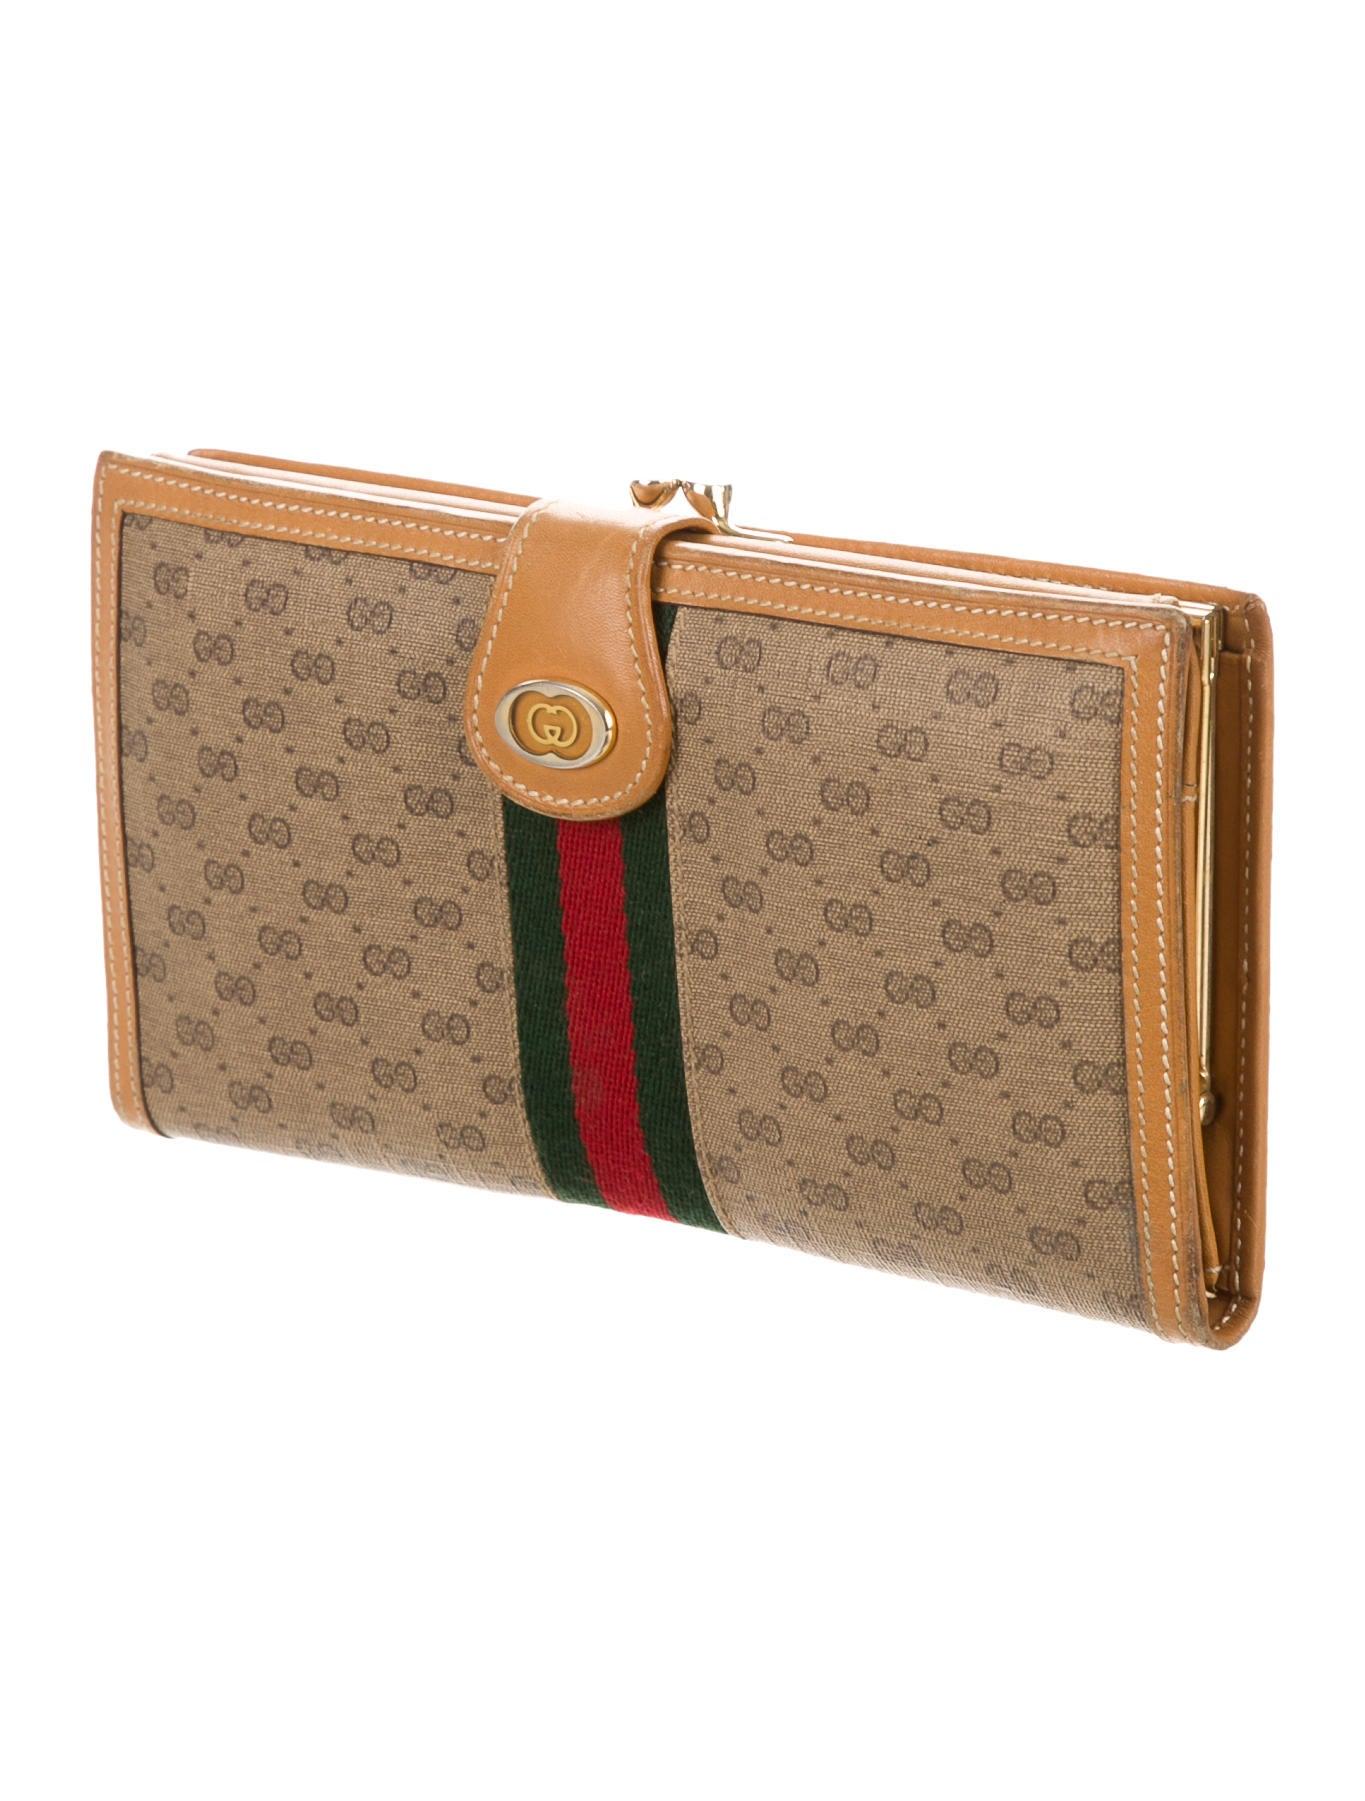 ed1369a13a0 Gucci GG Plus Web Wallet - Accessories - GUC114140